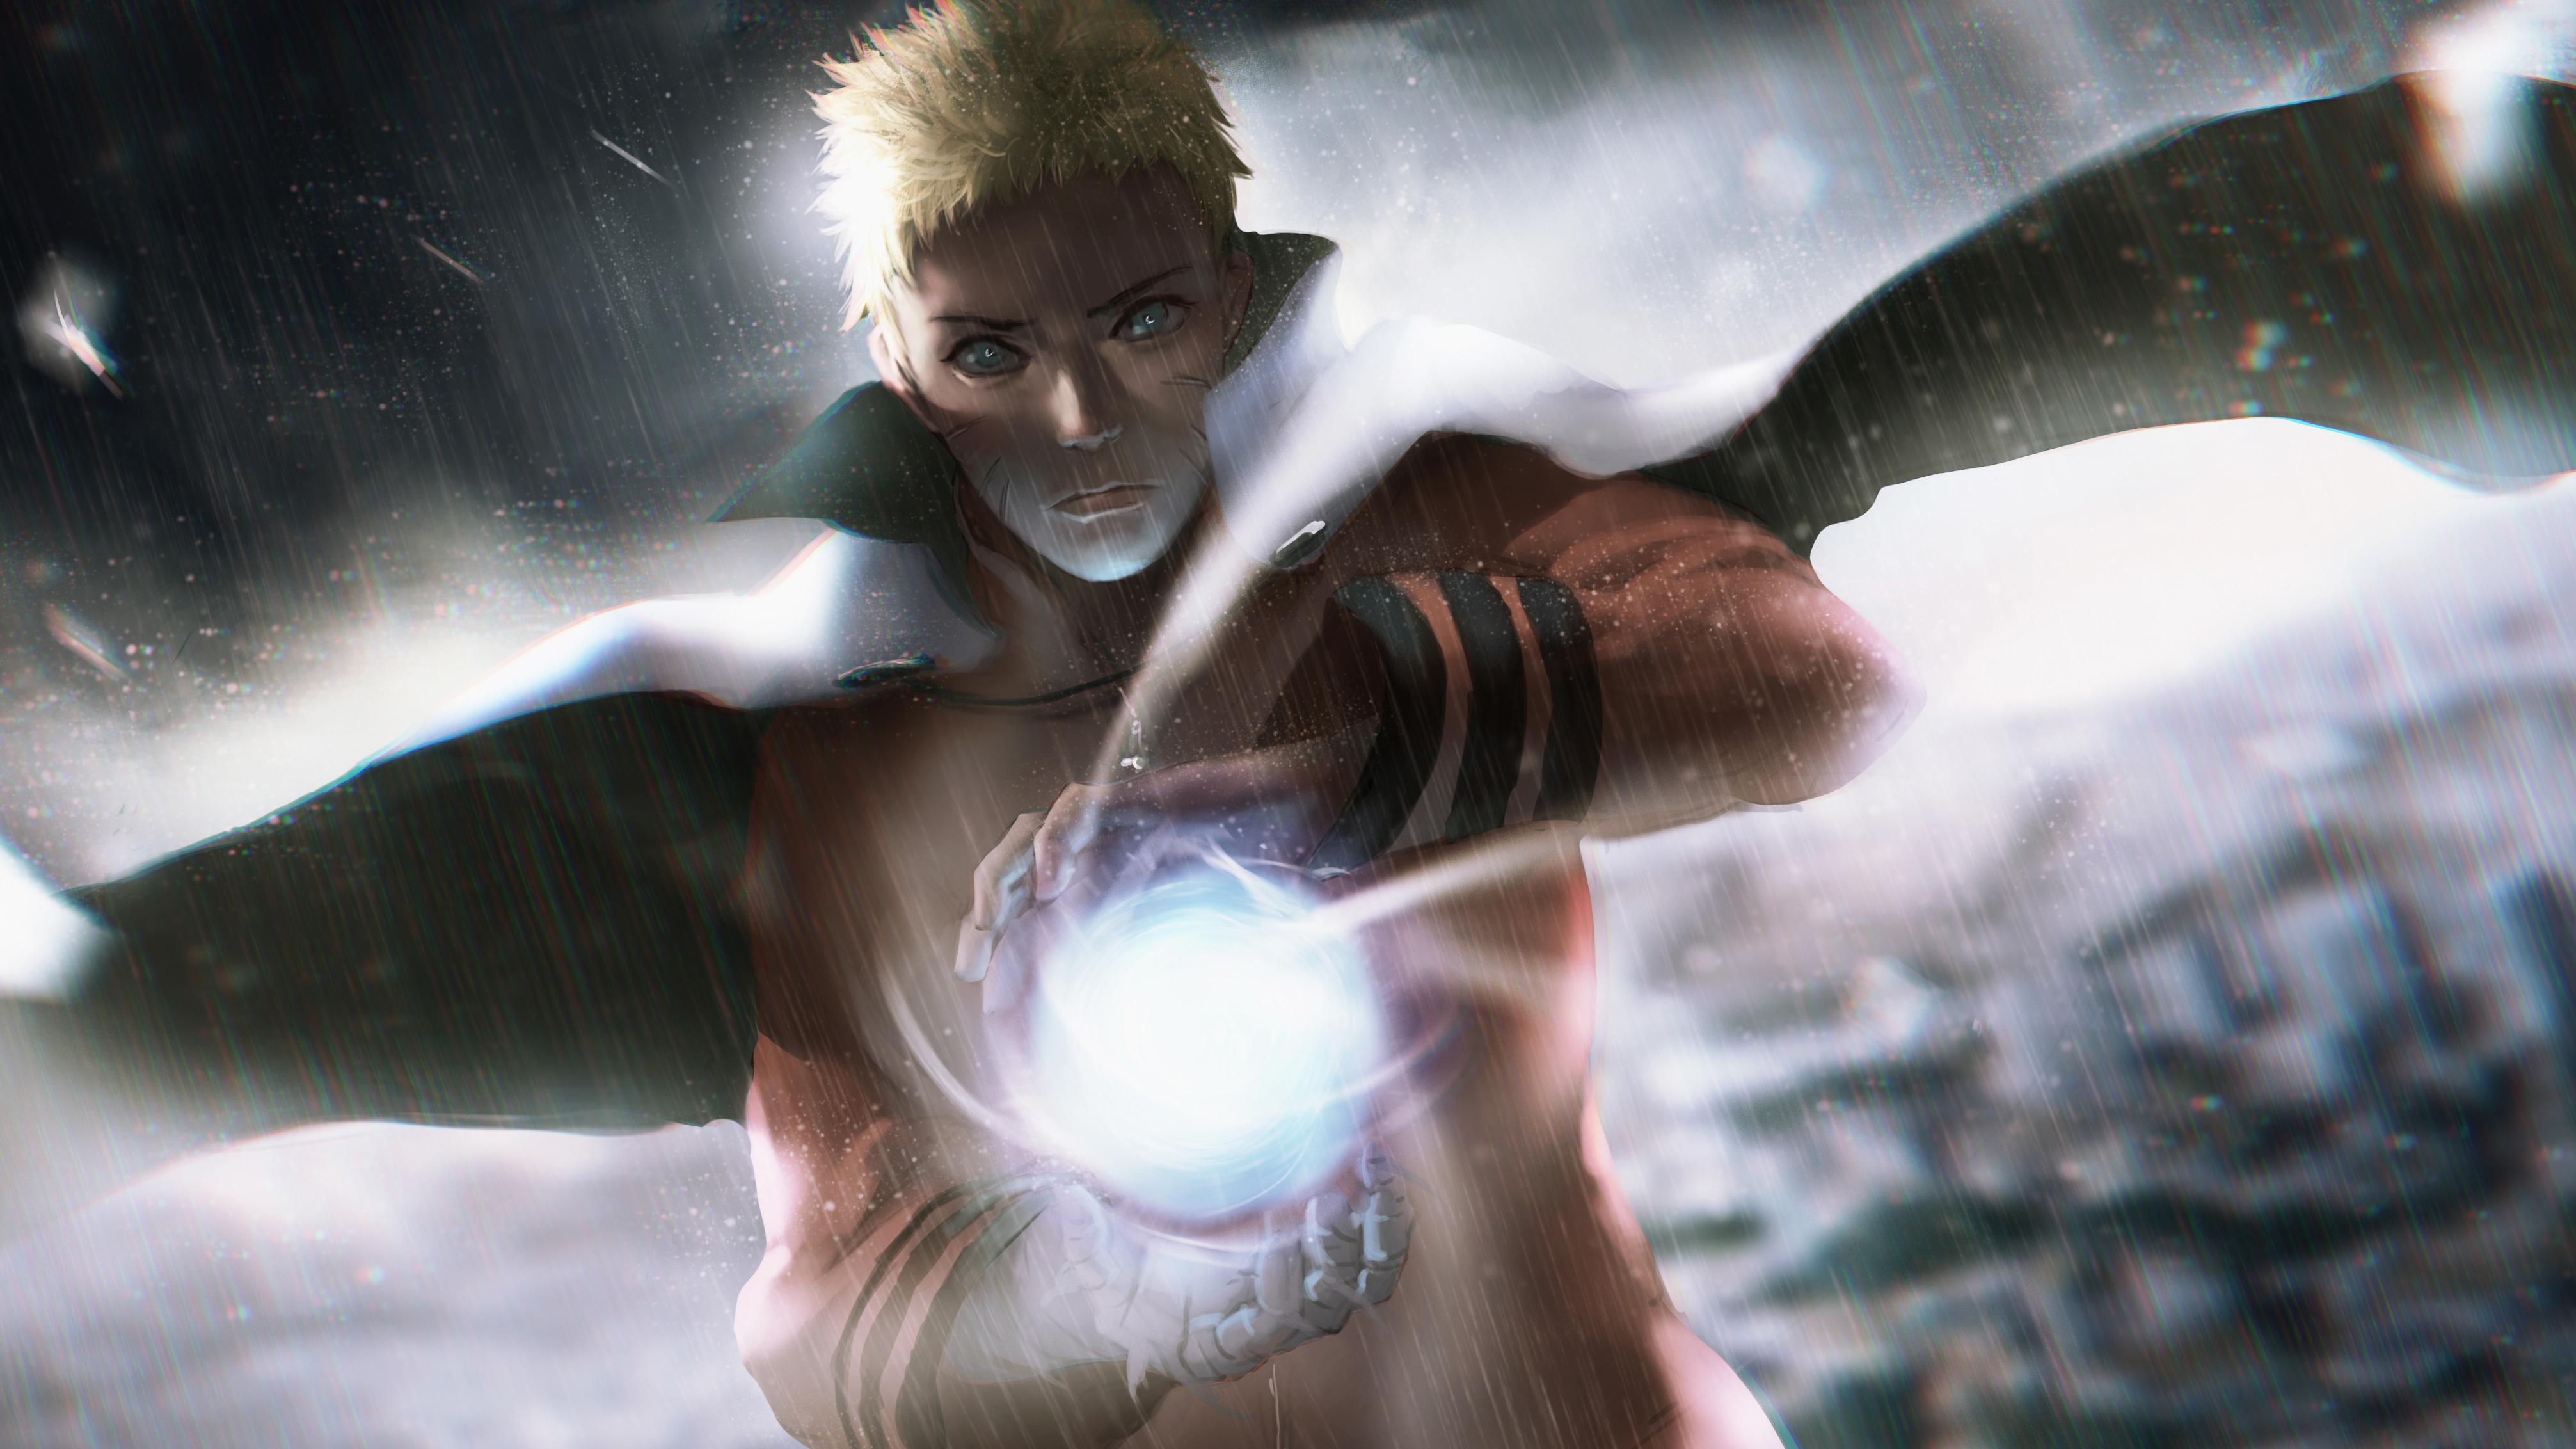 Naruto uzumaki 4k hd anime 4k wallpapers images - Anime background wallpaper 4k ...